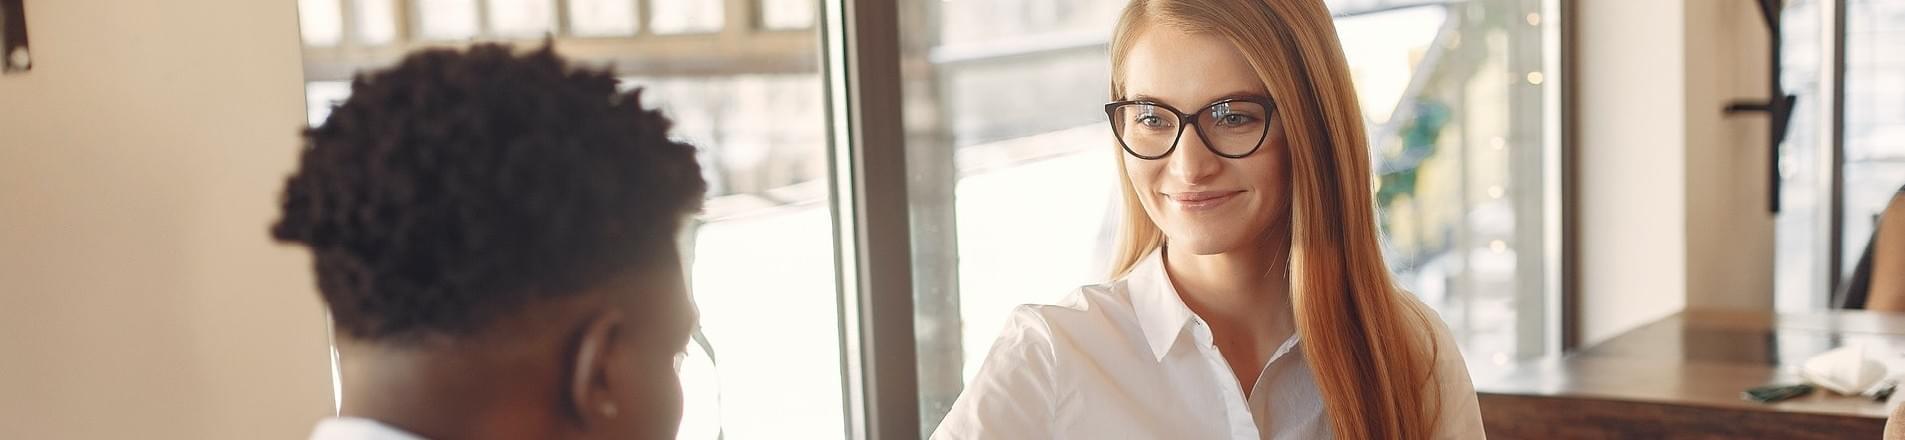 UWE Bristol: Five interview tips